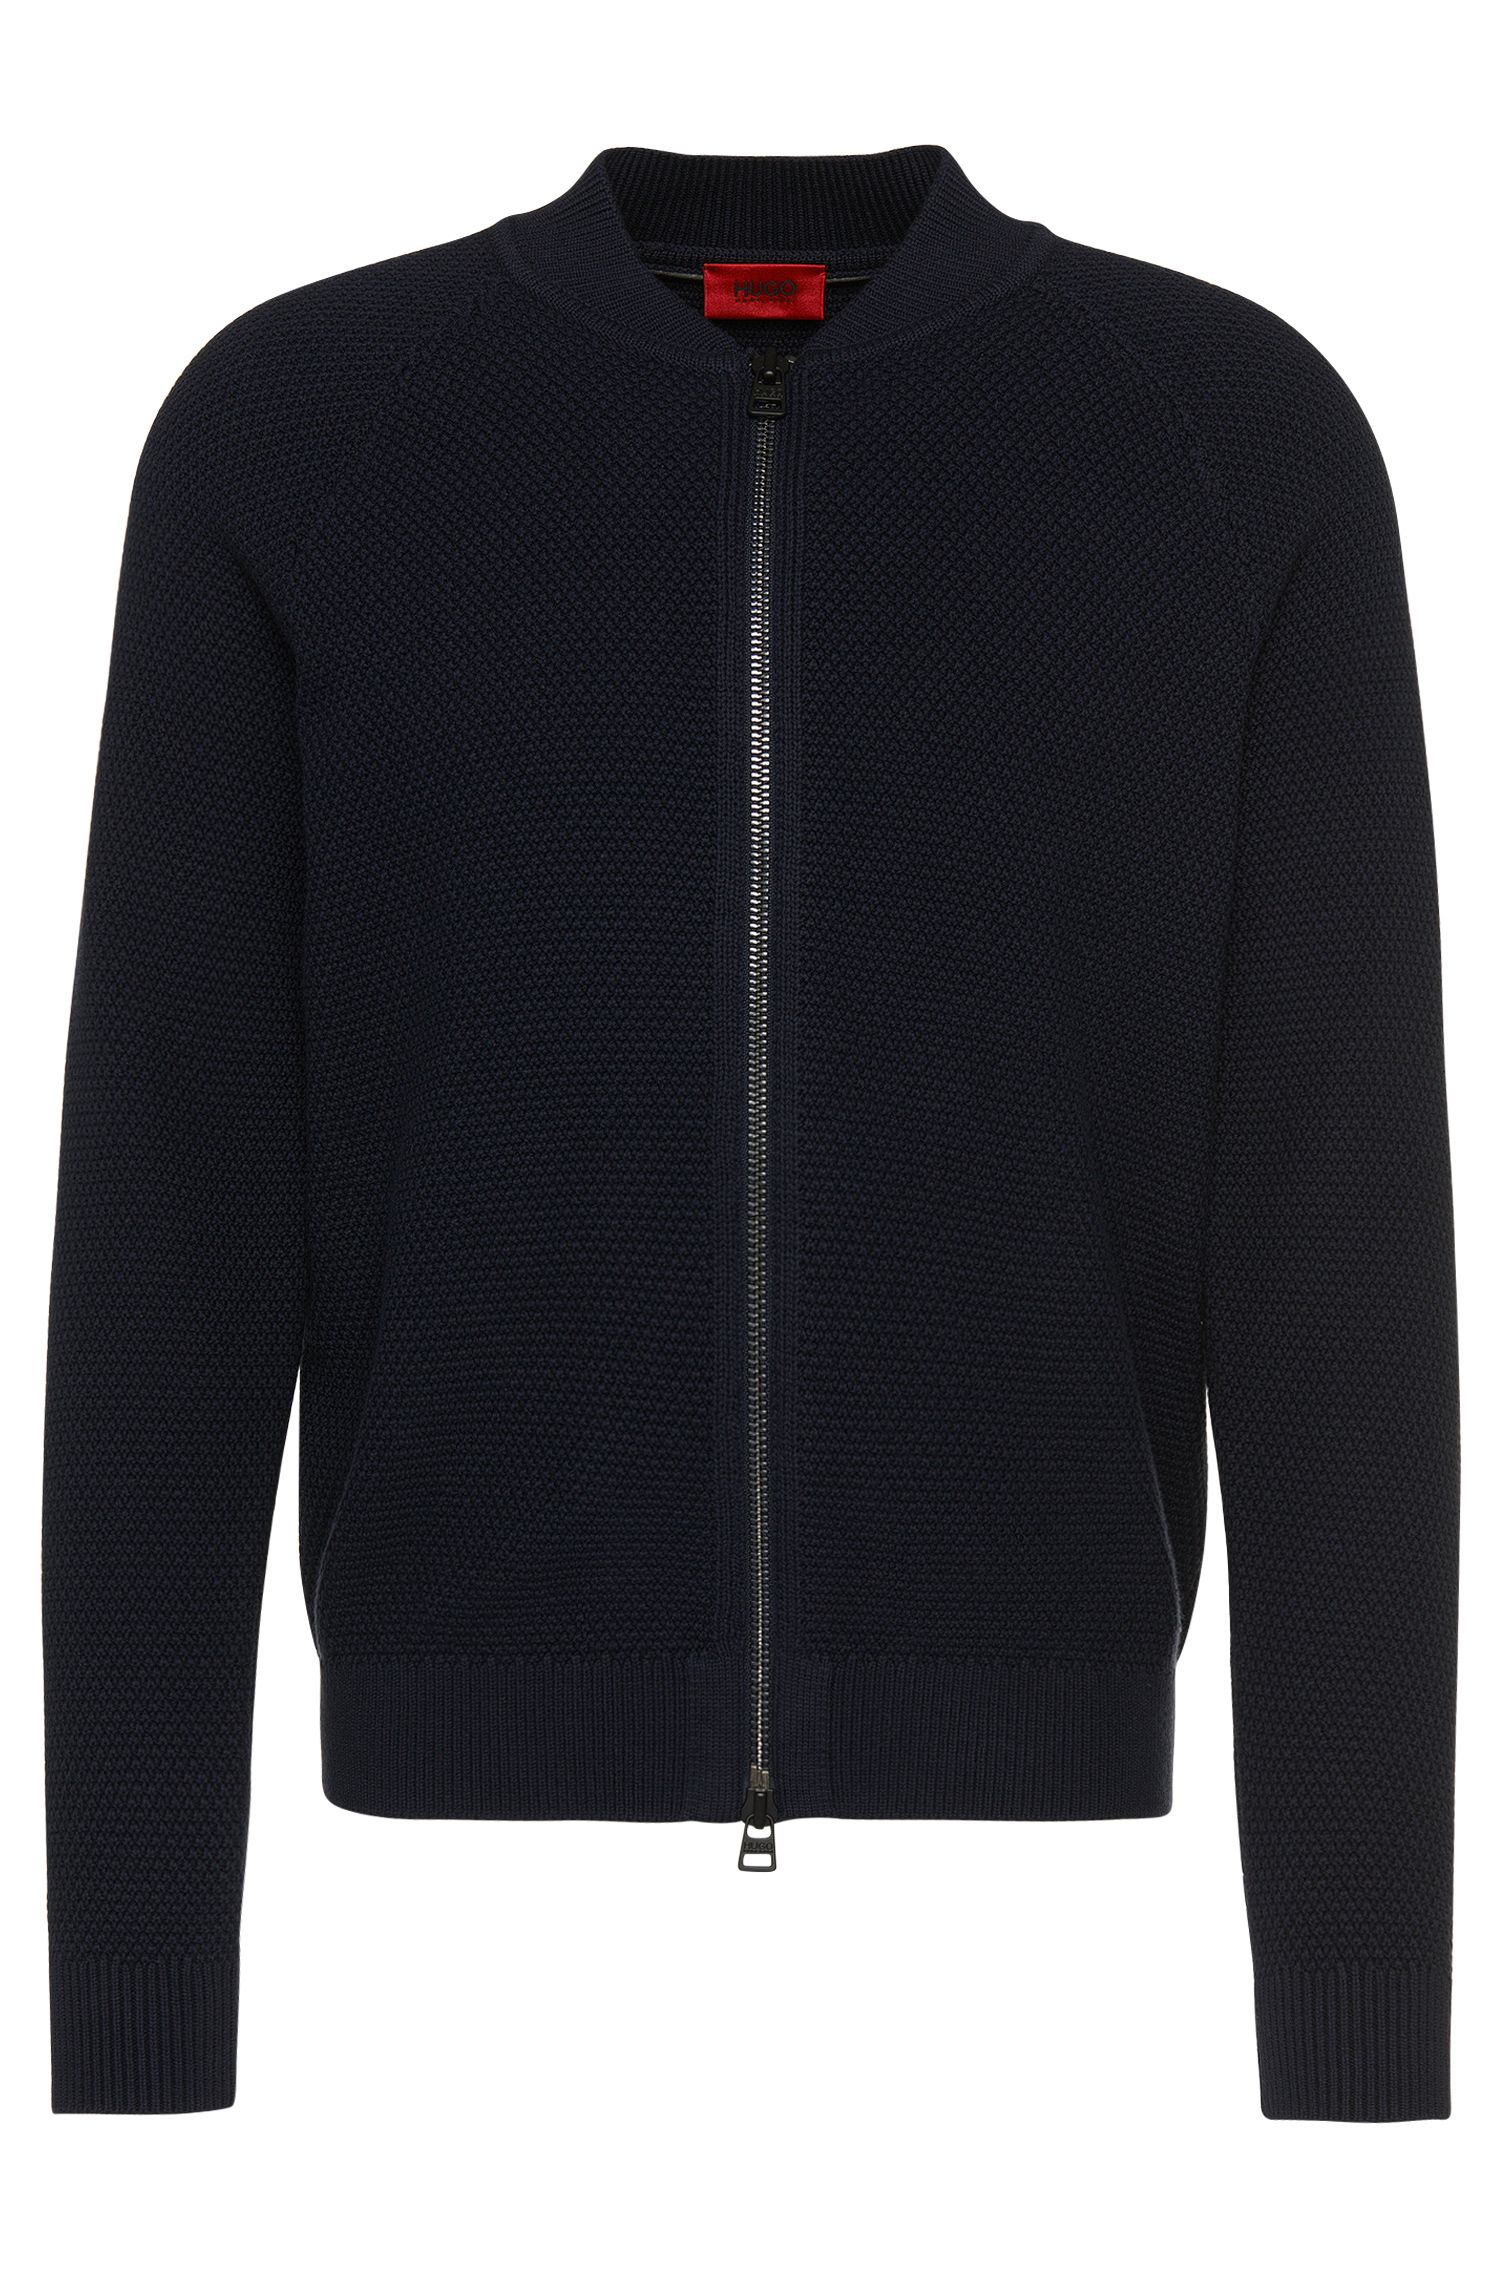 'Saio'   Virgin Wool Cotton Textured Zip Cardigan